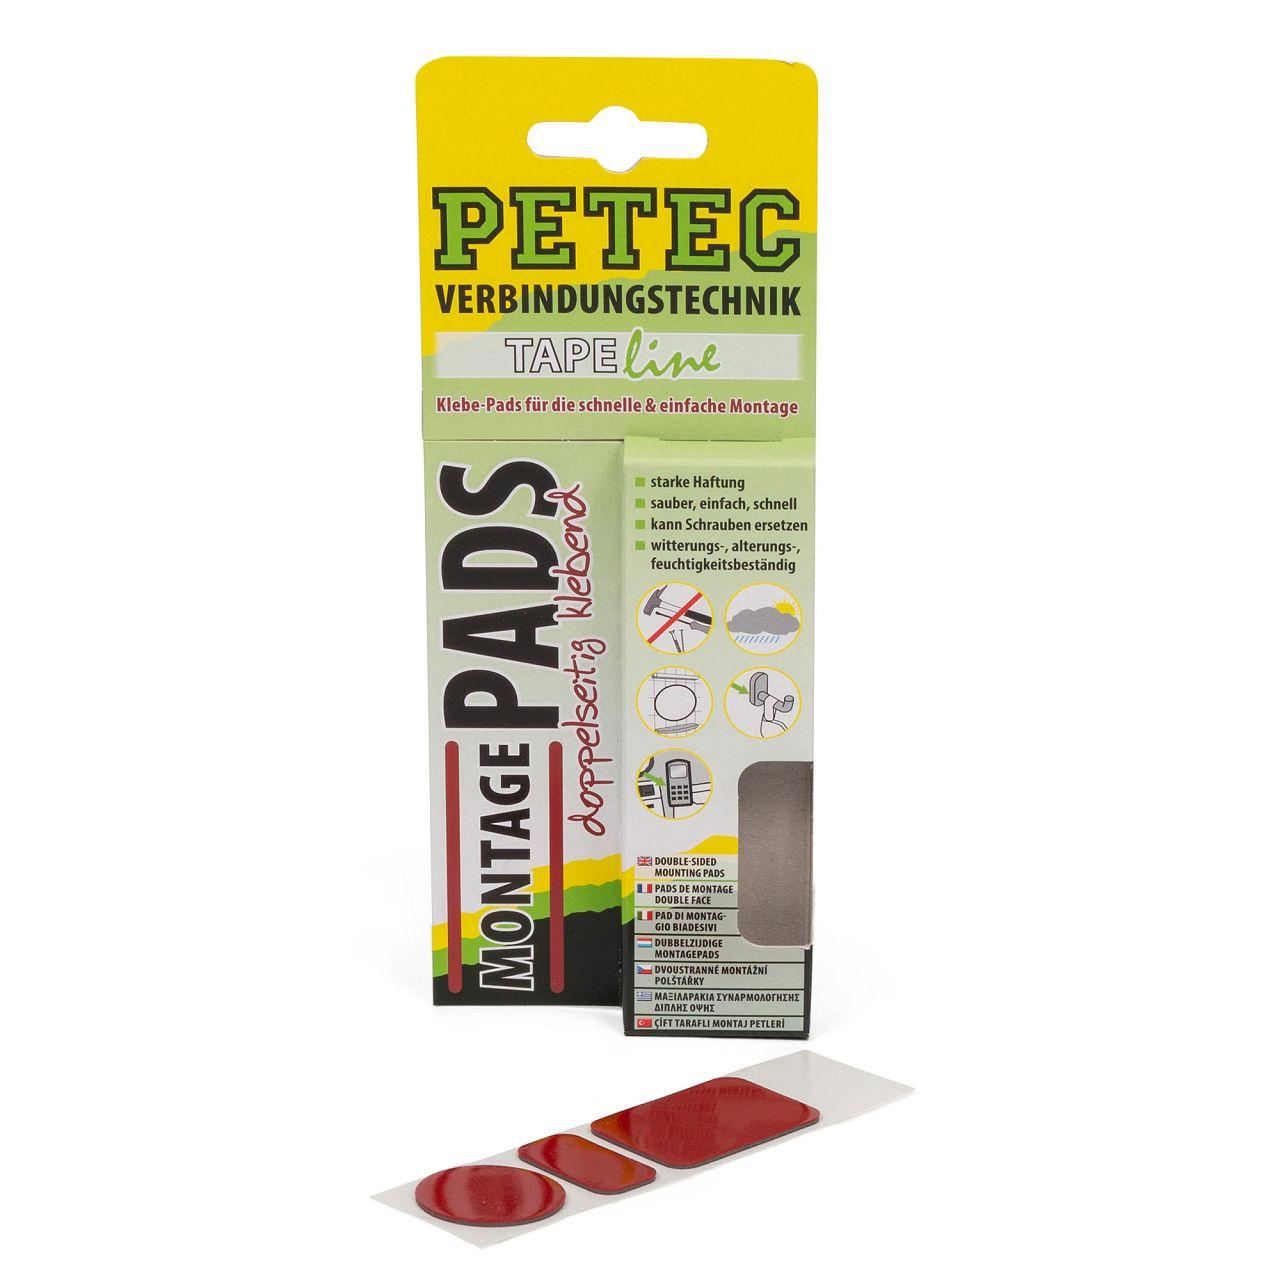 PETEC 87003 TAPELINE Klebe-pads Klebepads Montagepads doppelseitig klebend